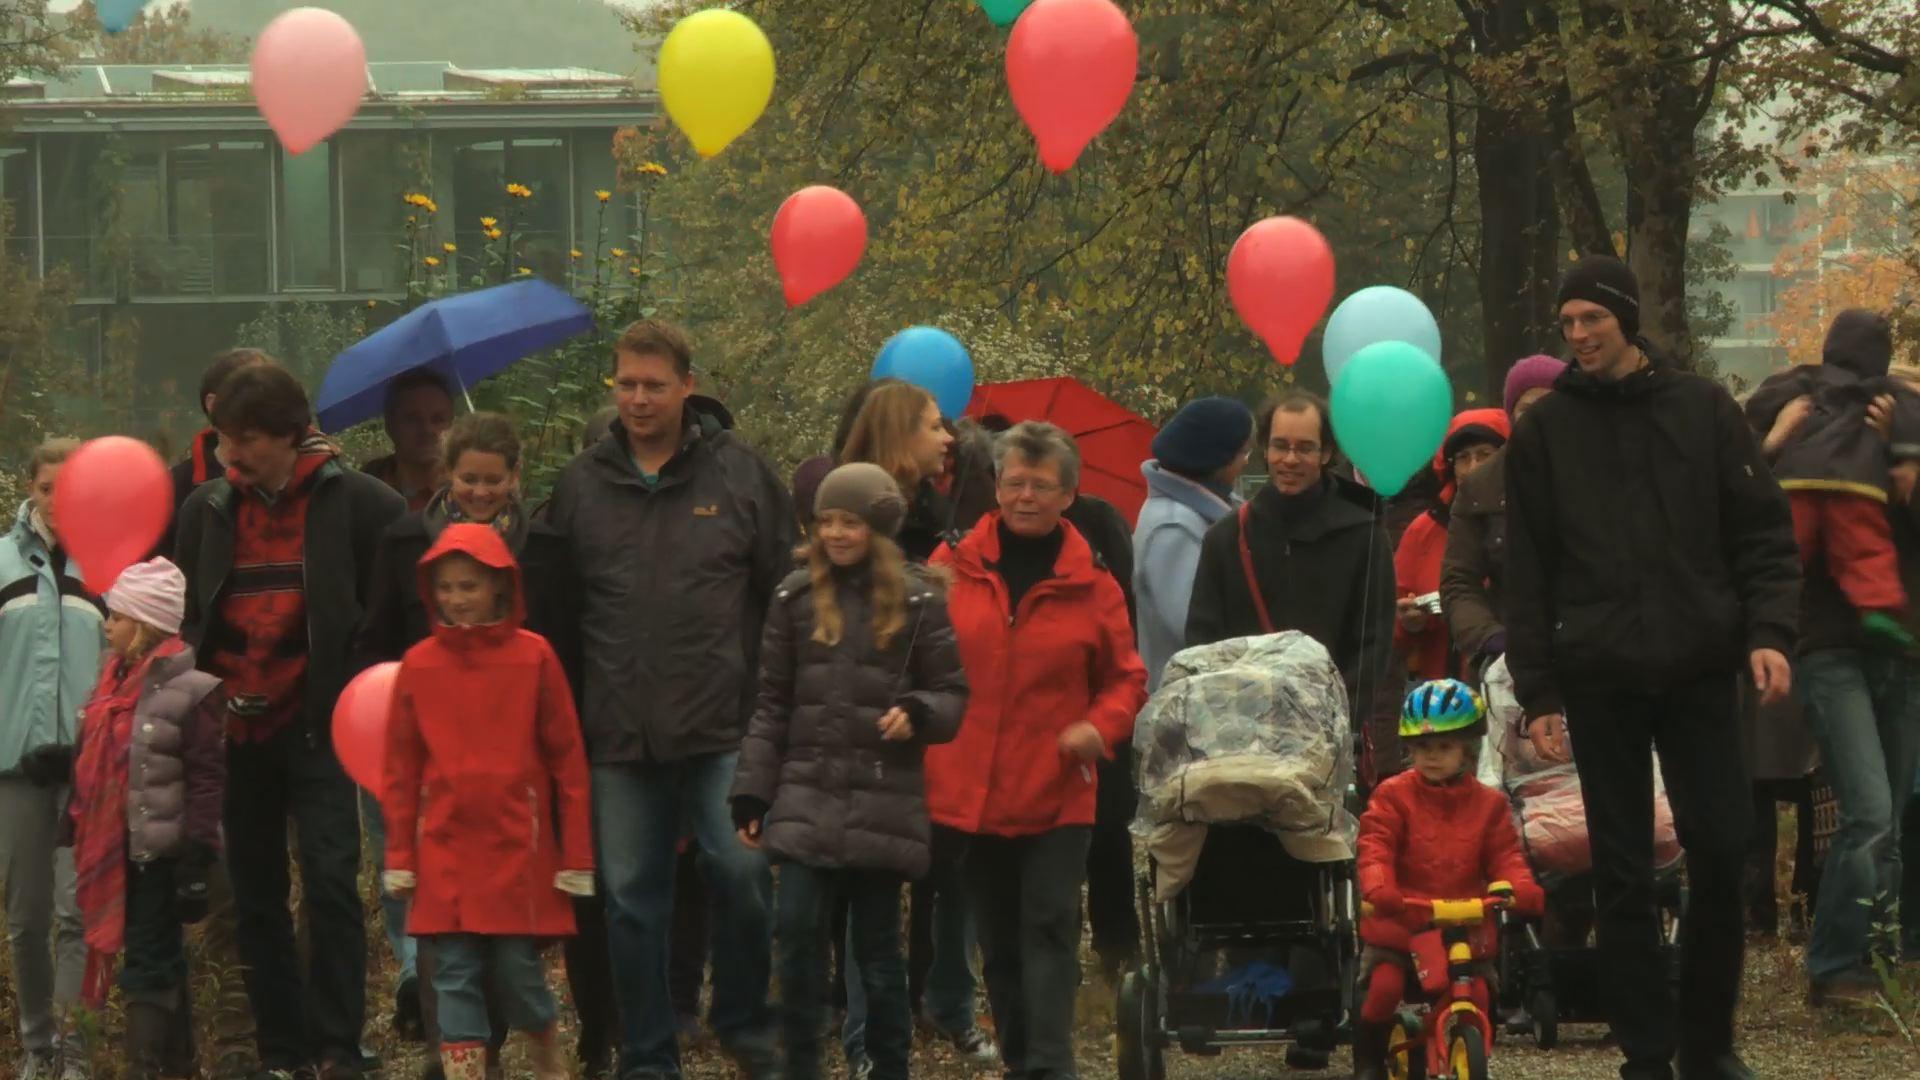 Gruppe_Luftballons